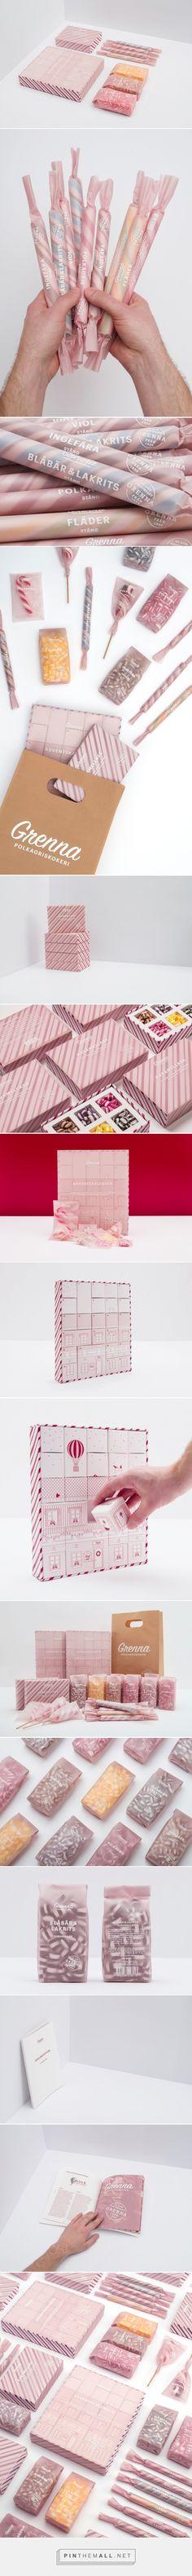 Designed by @brobygrafiska students ❤ Grenna Polkagriskokeri #candy #packaging #design #concept Design team - Johanna Brännström, Viktor Andersson, Pontus Haglund, Gustaf Redmo http://www.packagingoftheworld.com/2017/05/grenna-polkagriskokeri-student-project.html